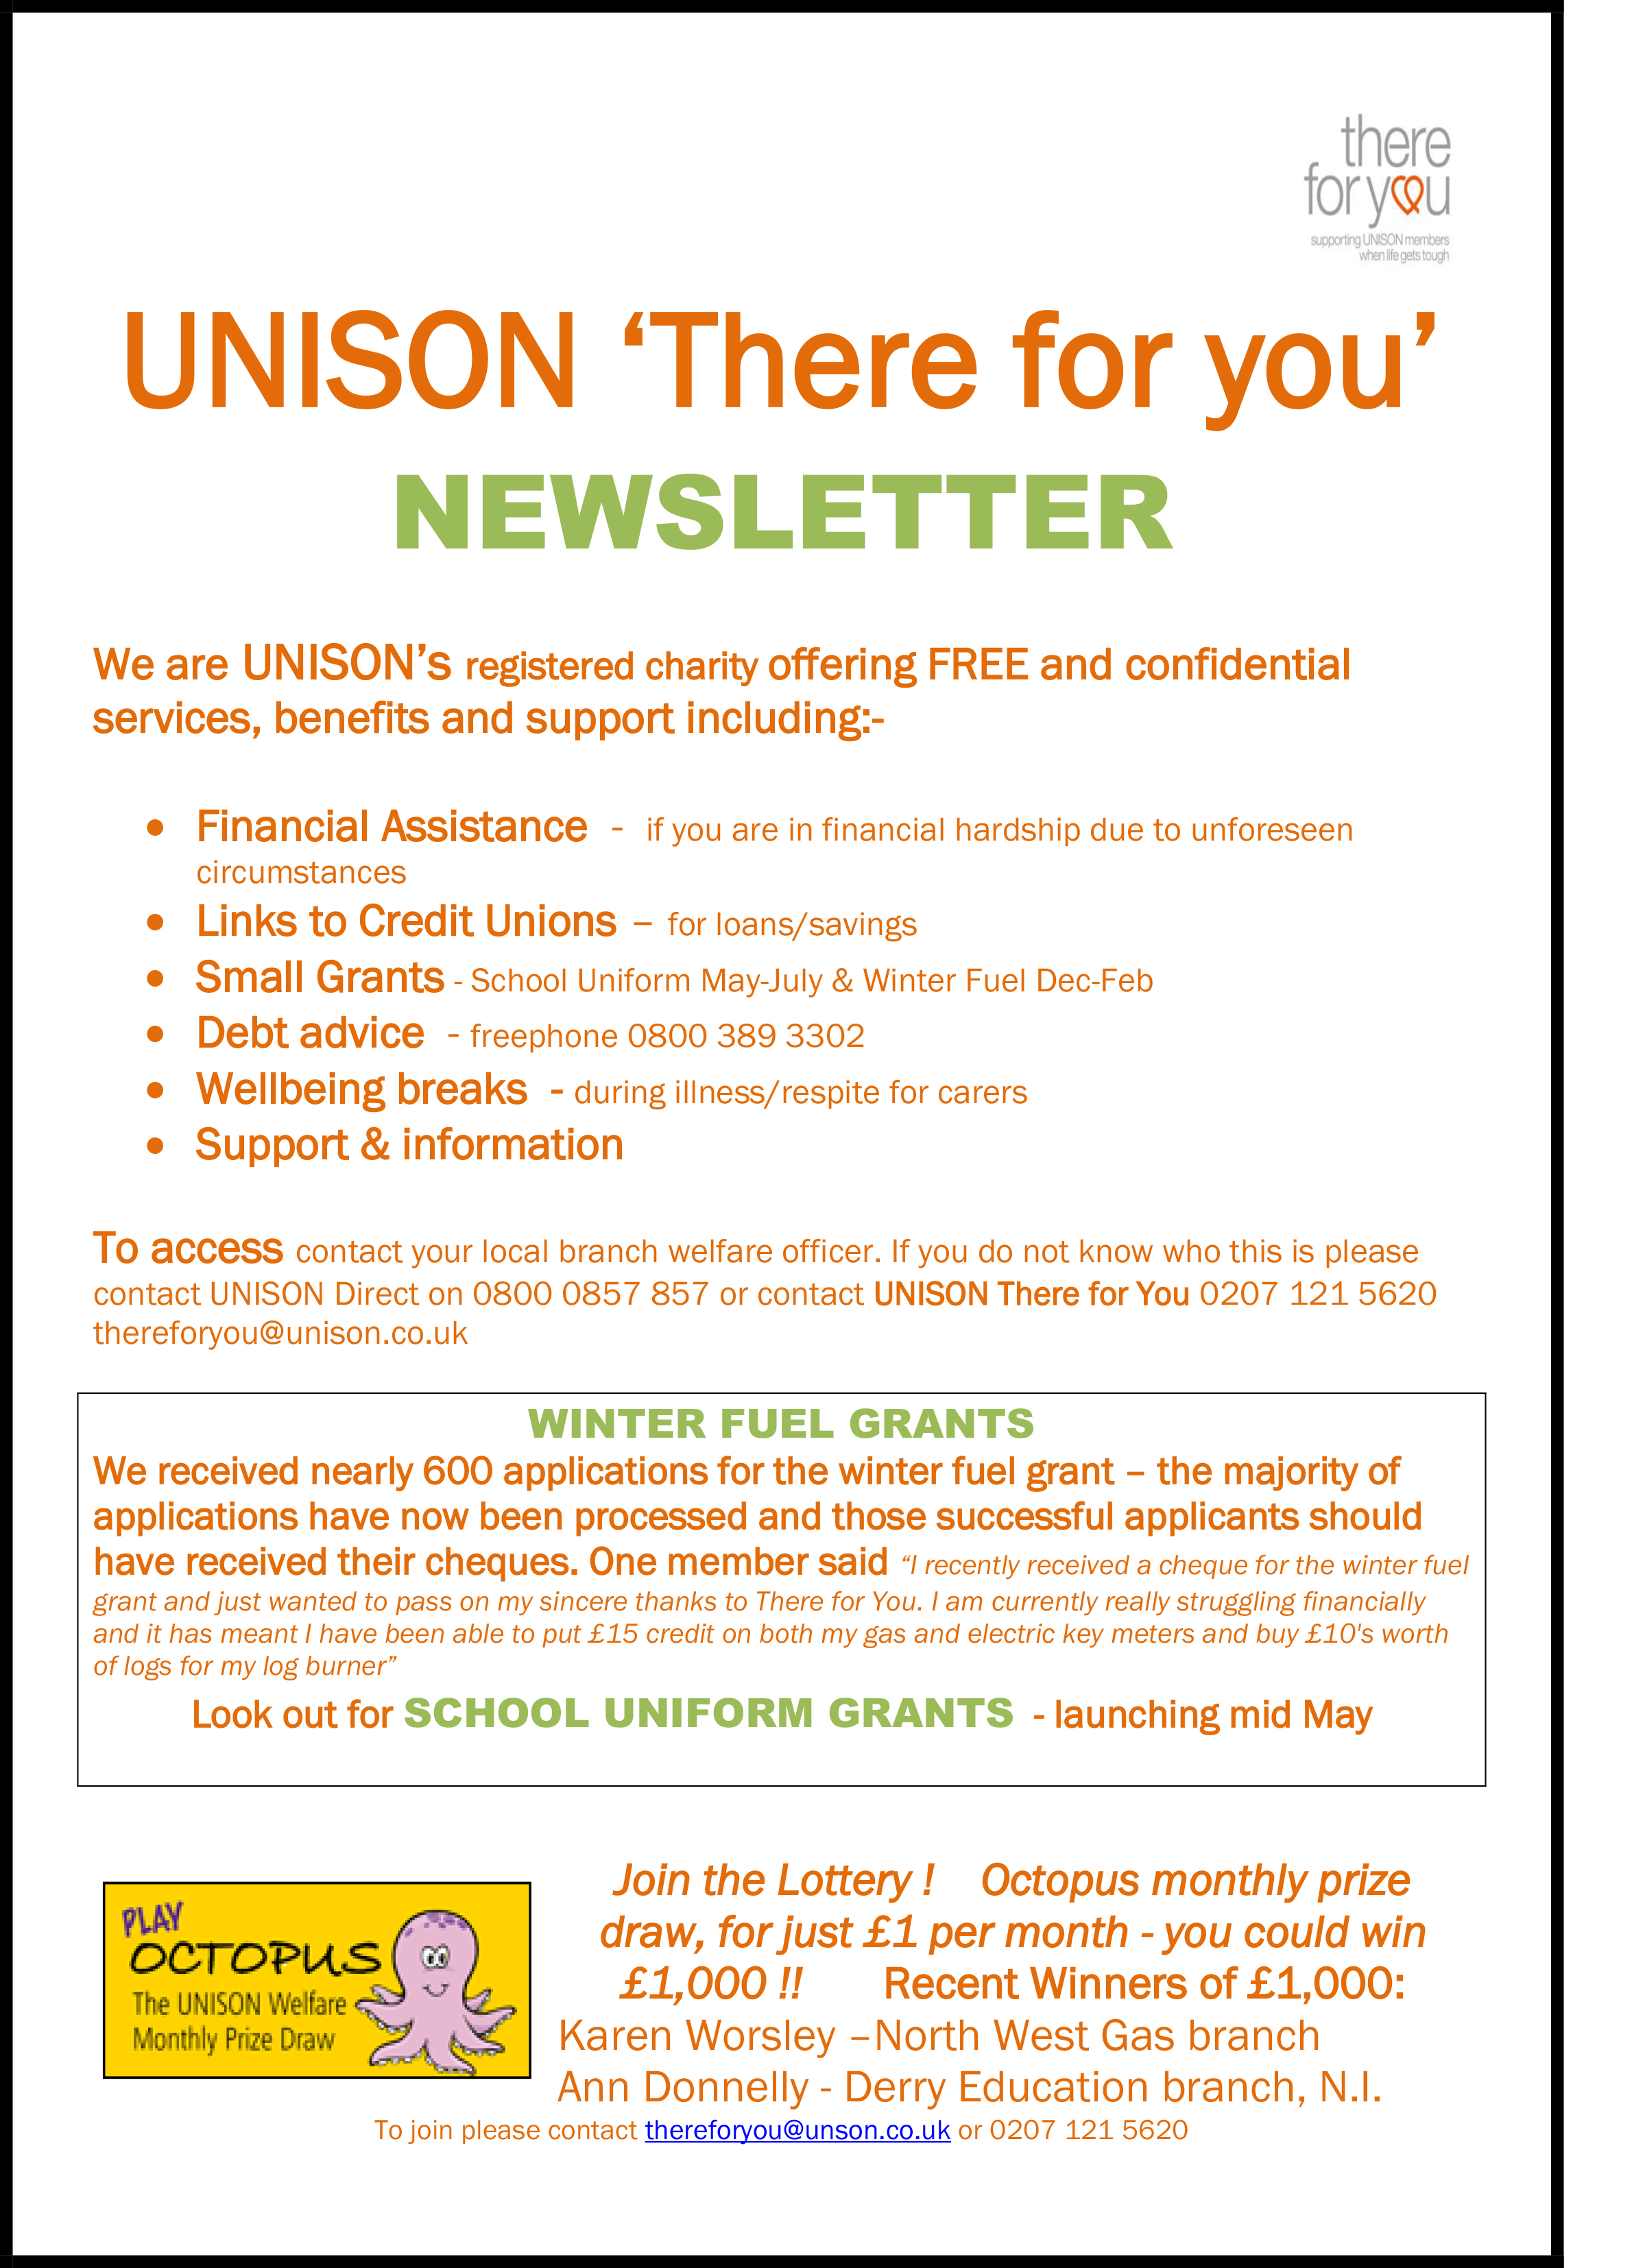 UNISON-Welfare-Newsletter-april-2016-1